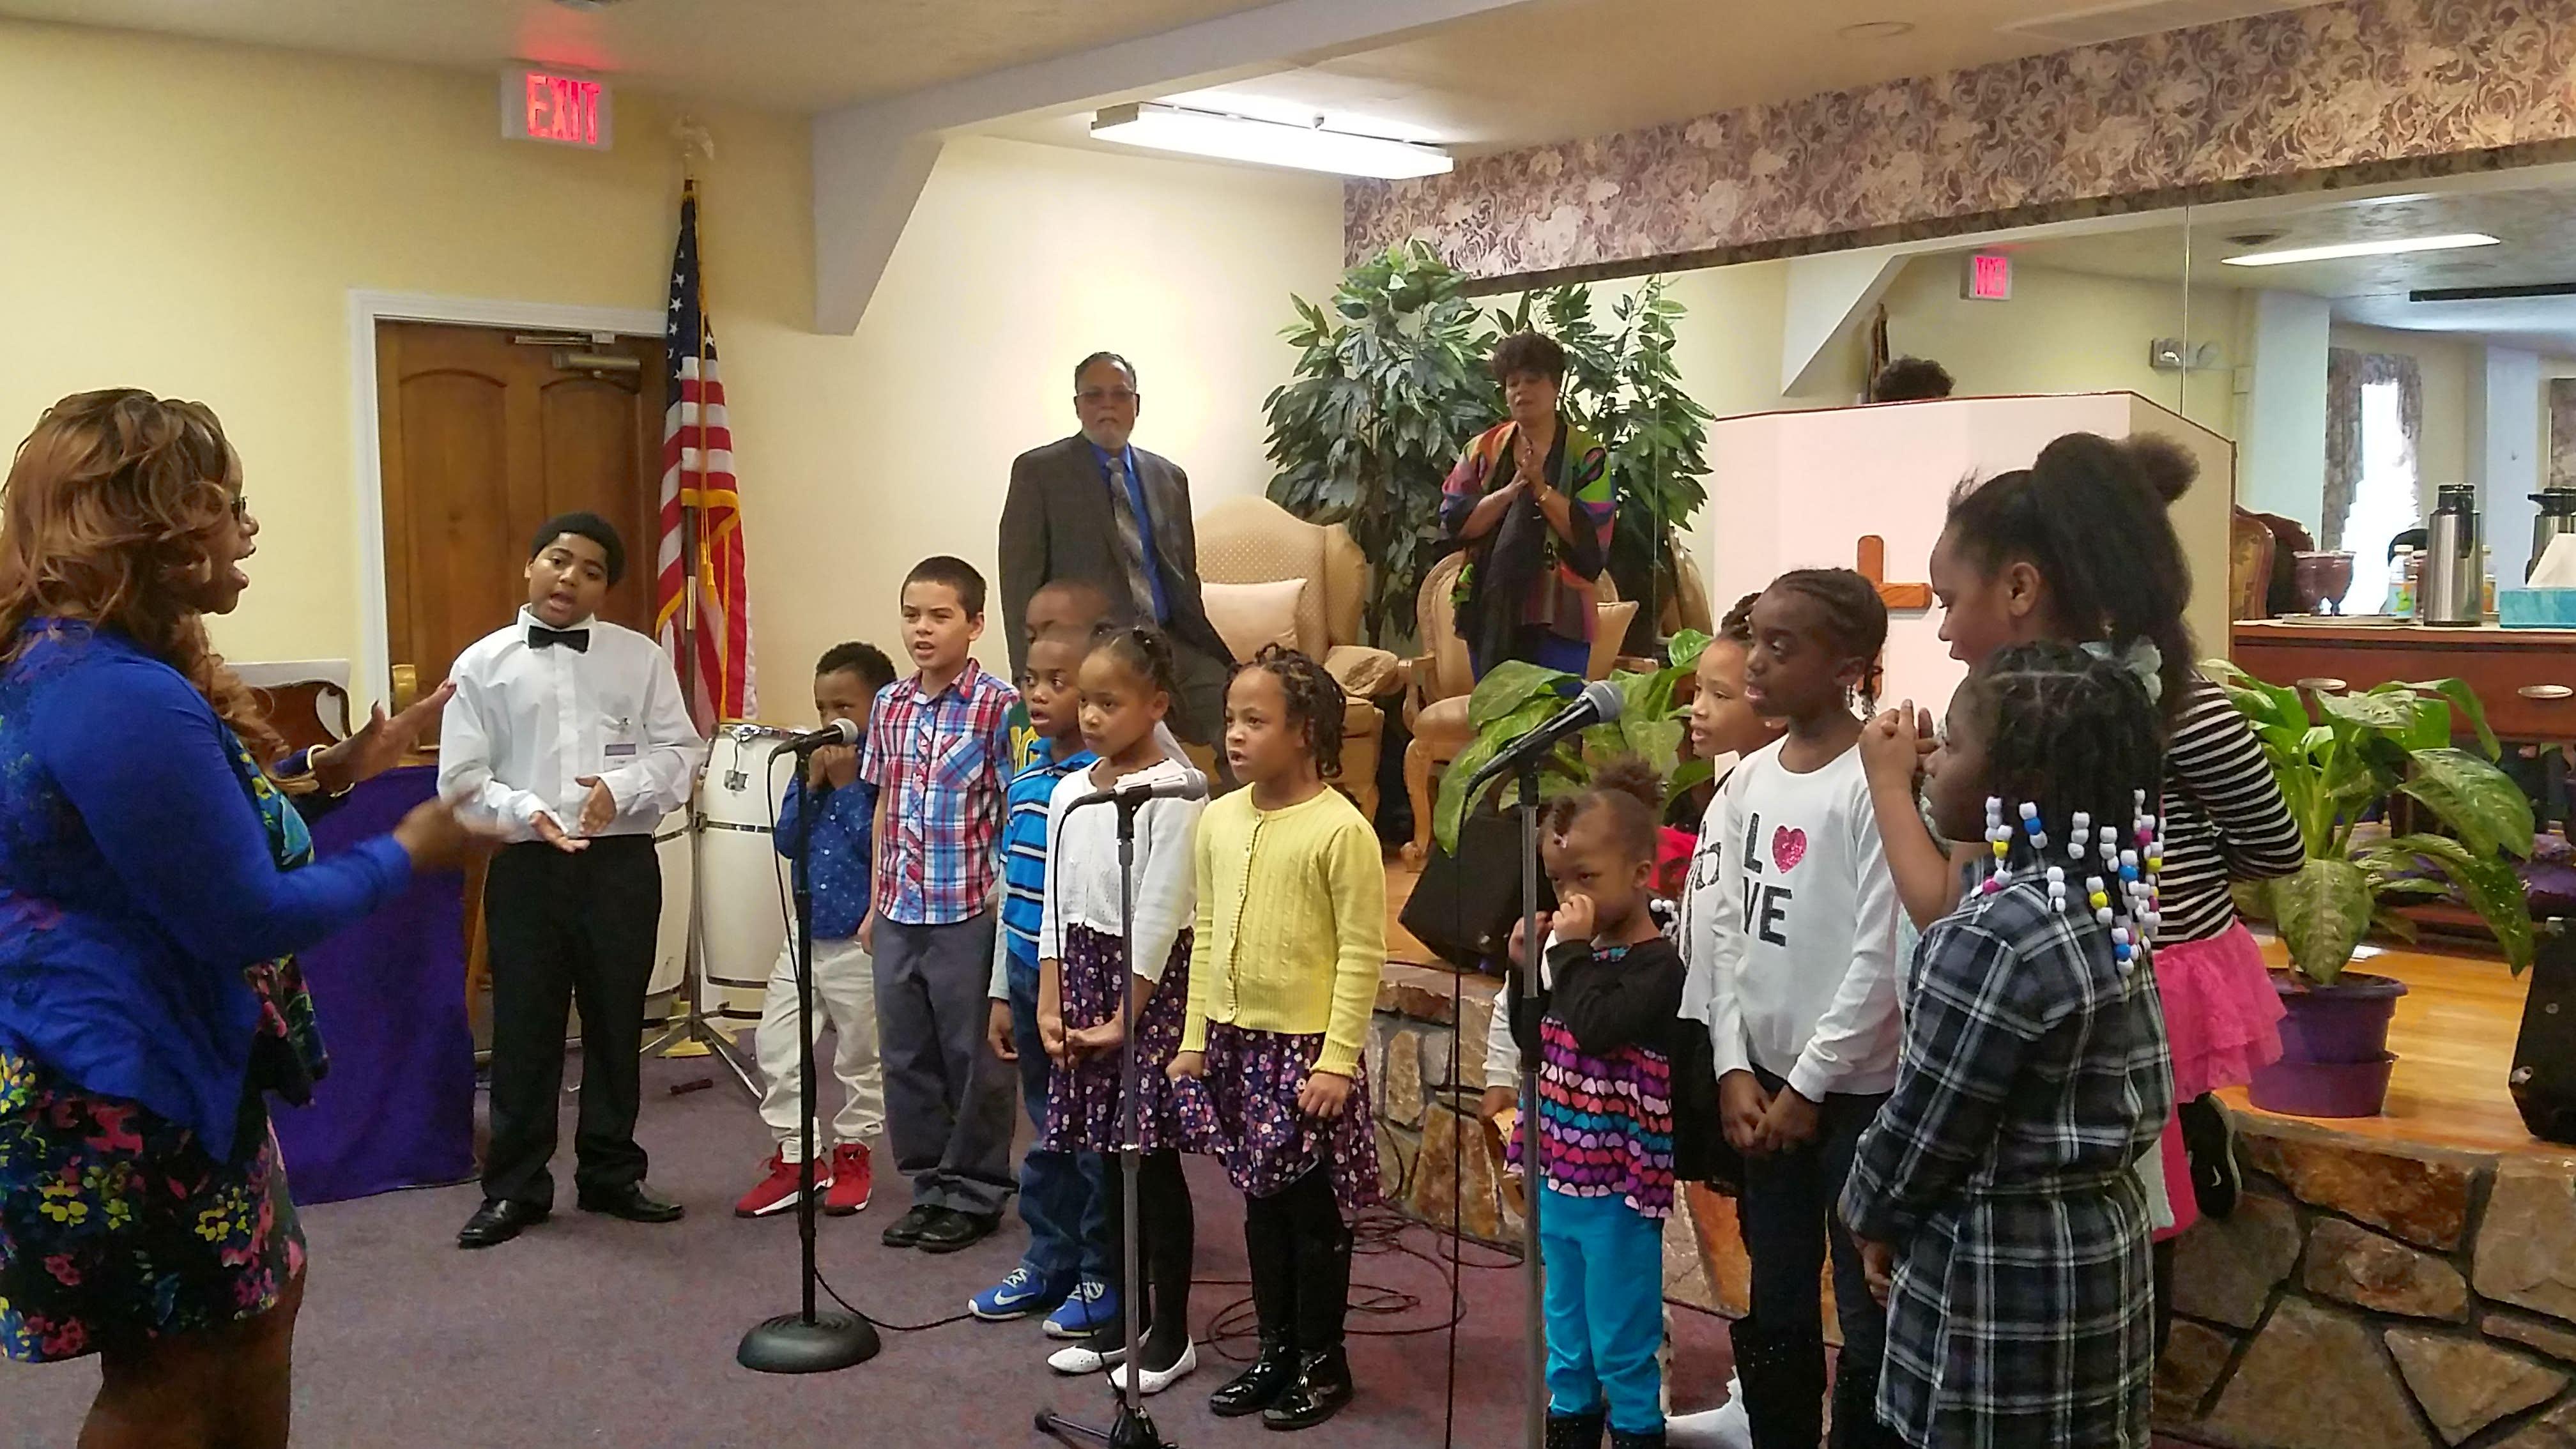 Kids' Choir Ministry